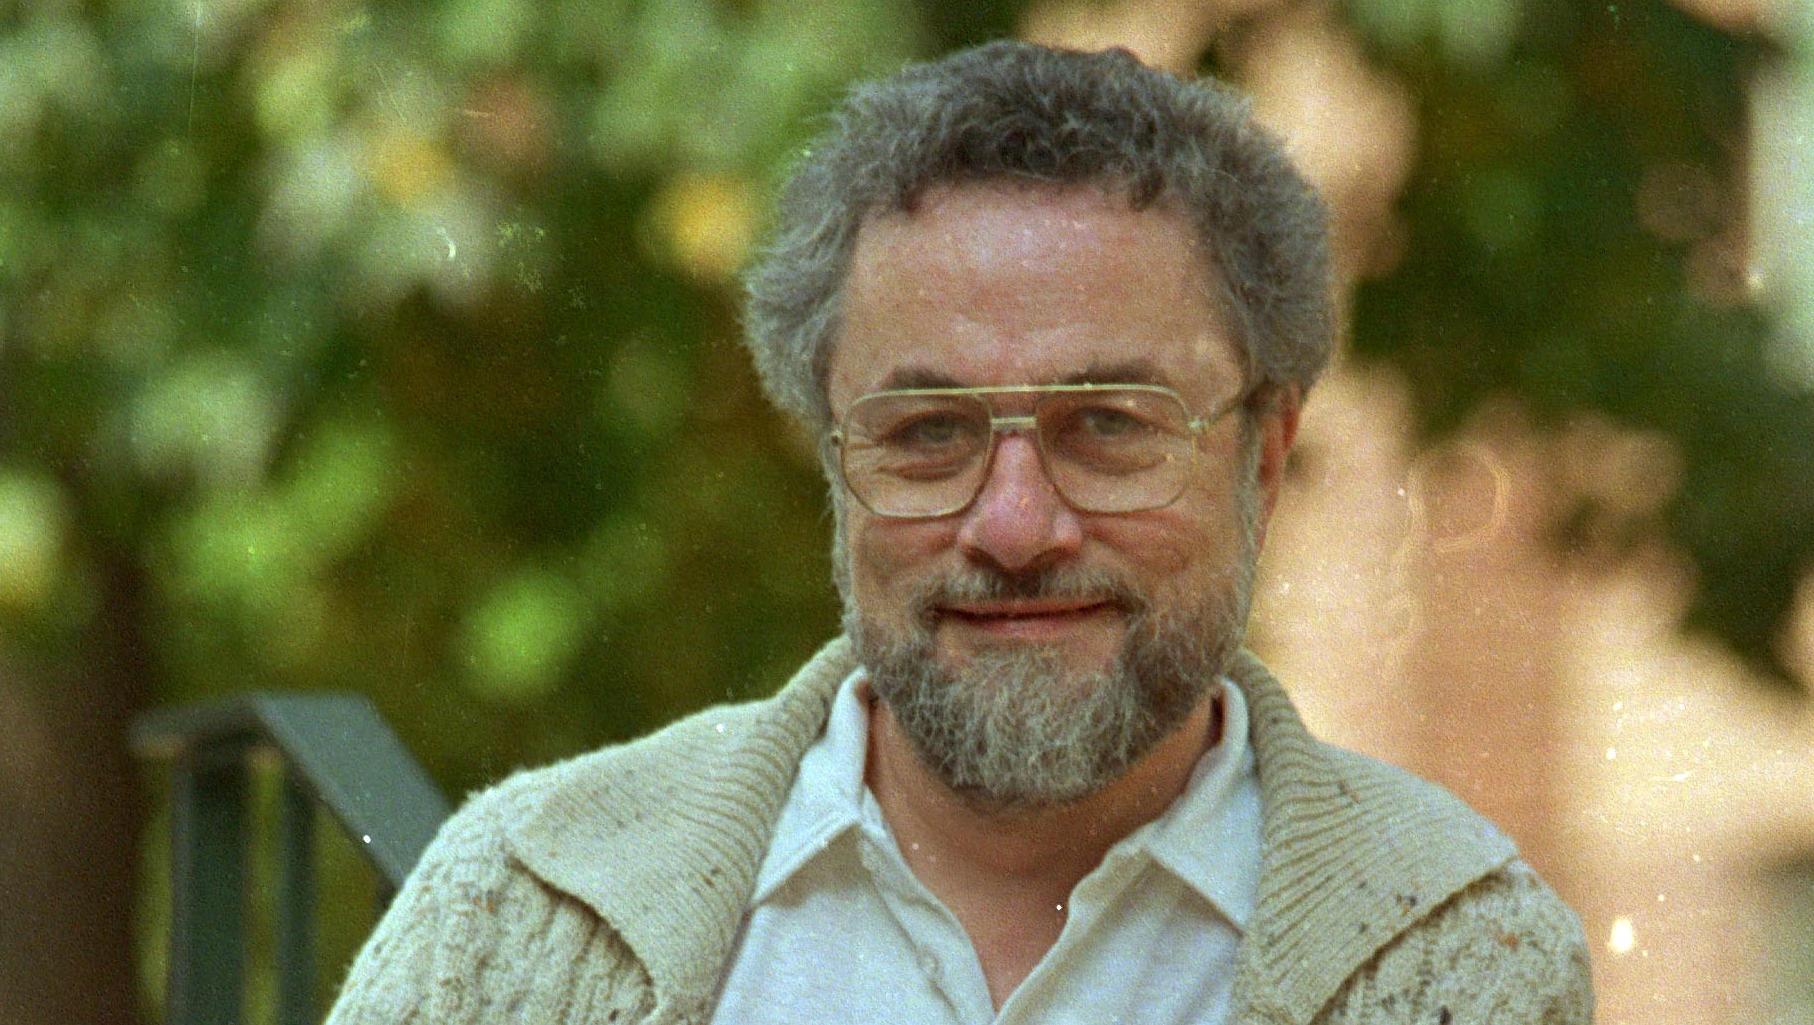 Adrian Joseph Cronauer Real Life Good Morning Vietnam Dj Is Dead At 79